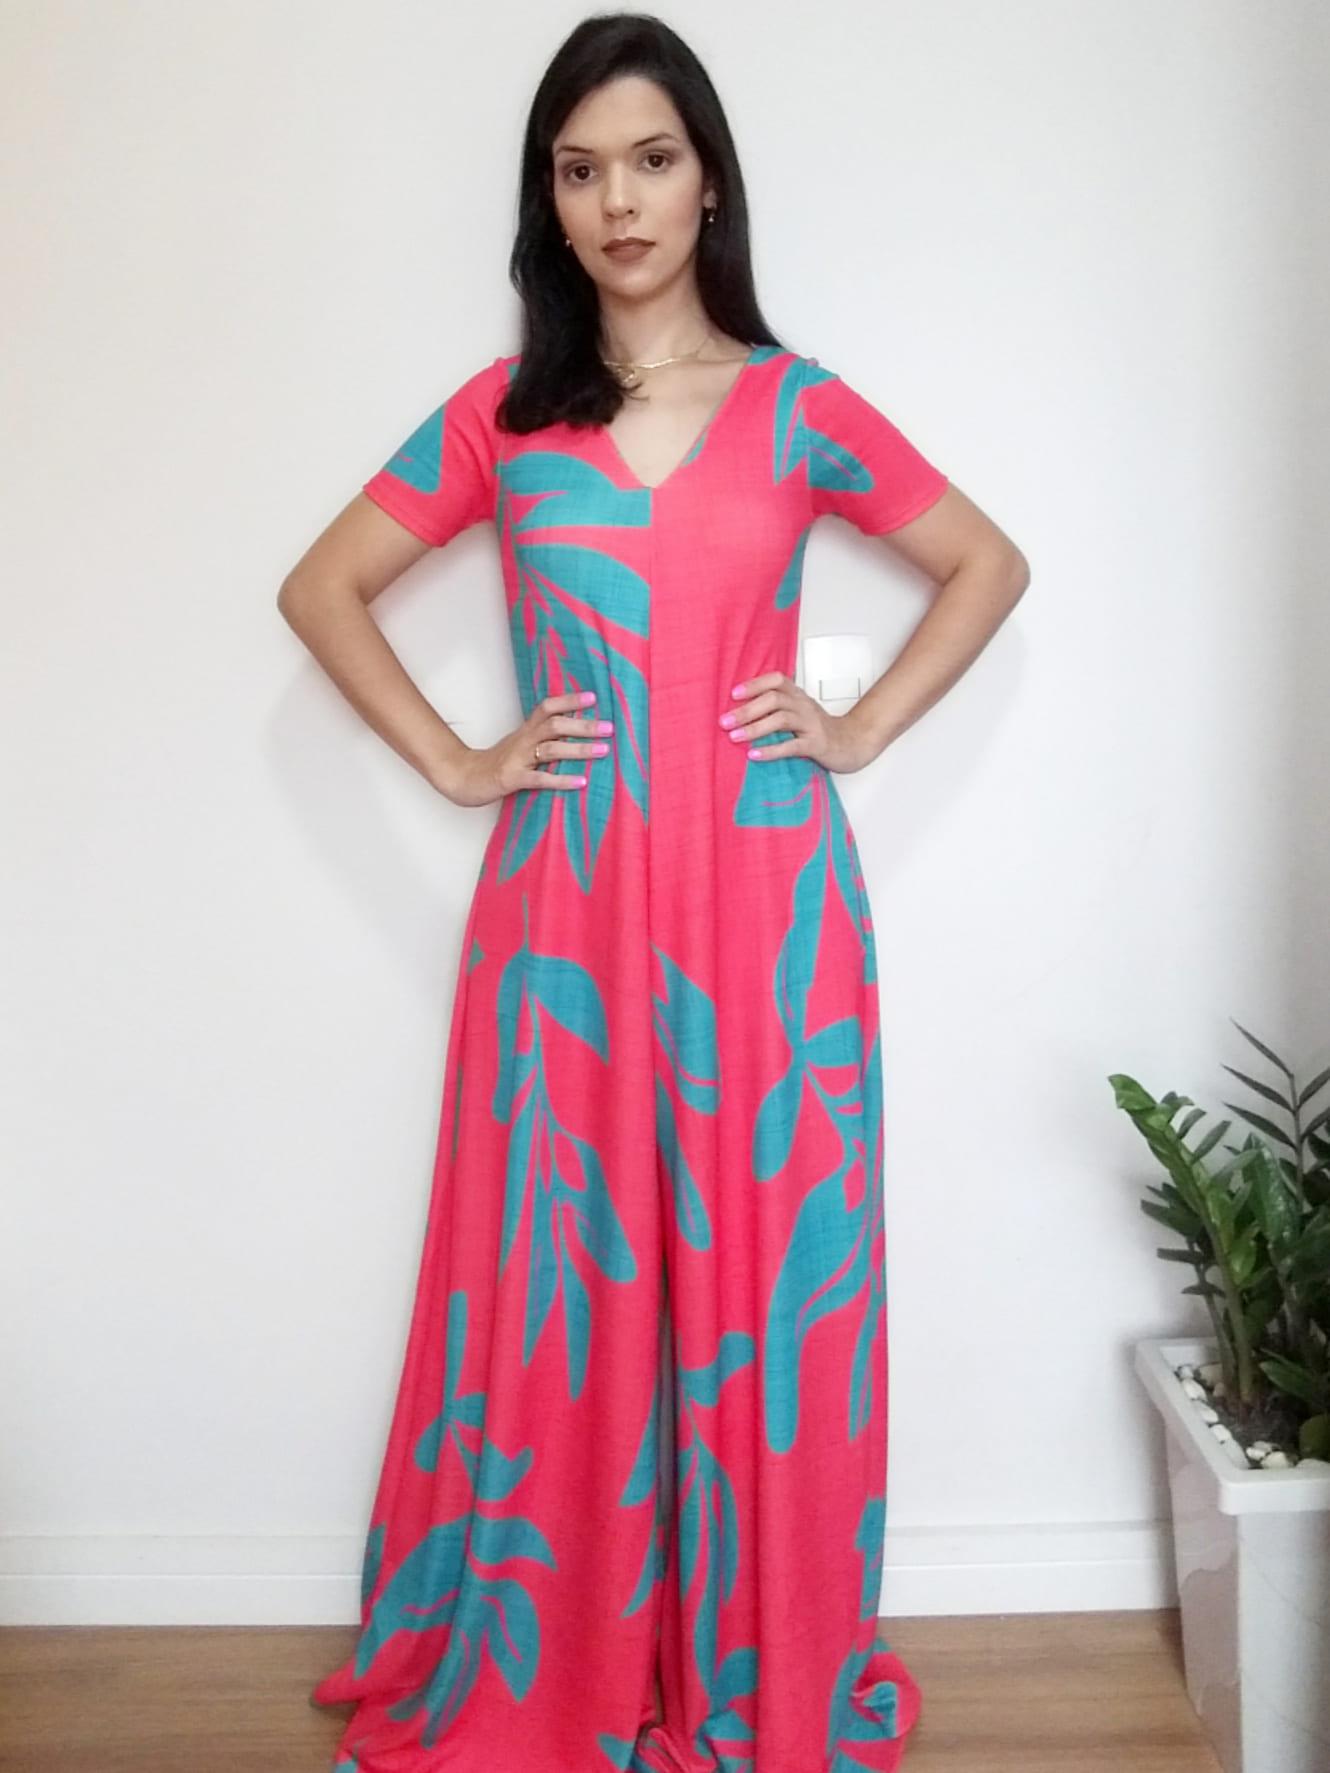 Macacão oversized pink azul